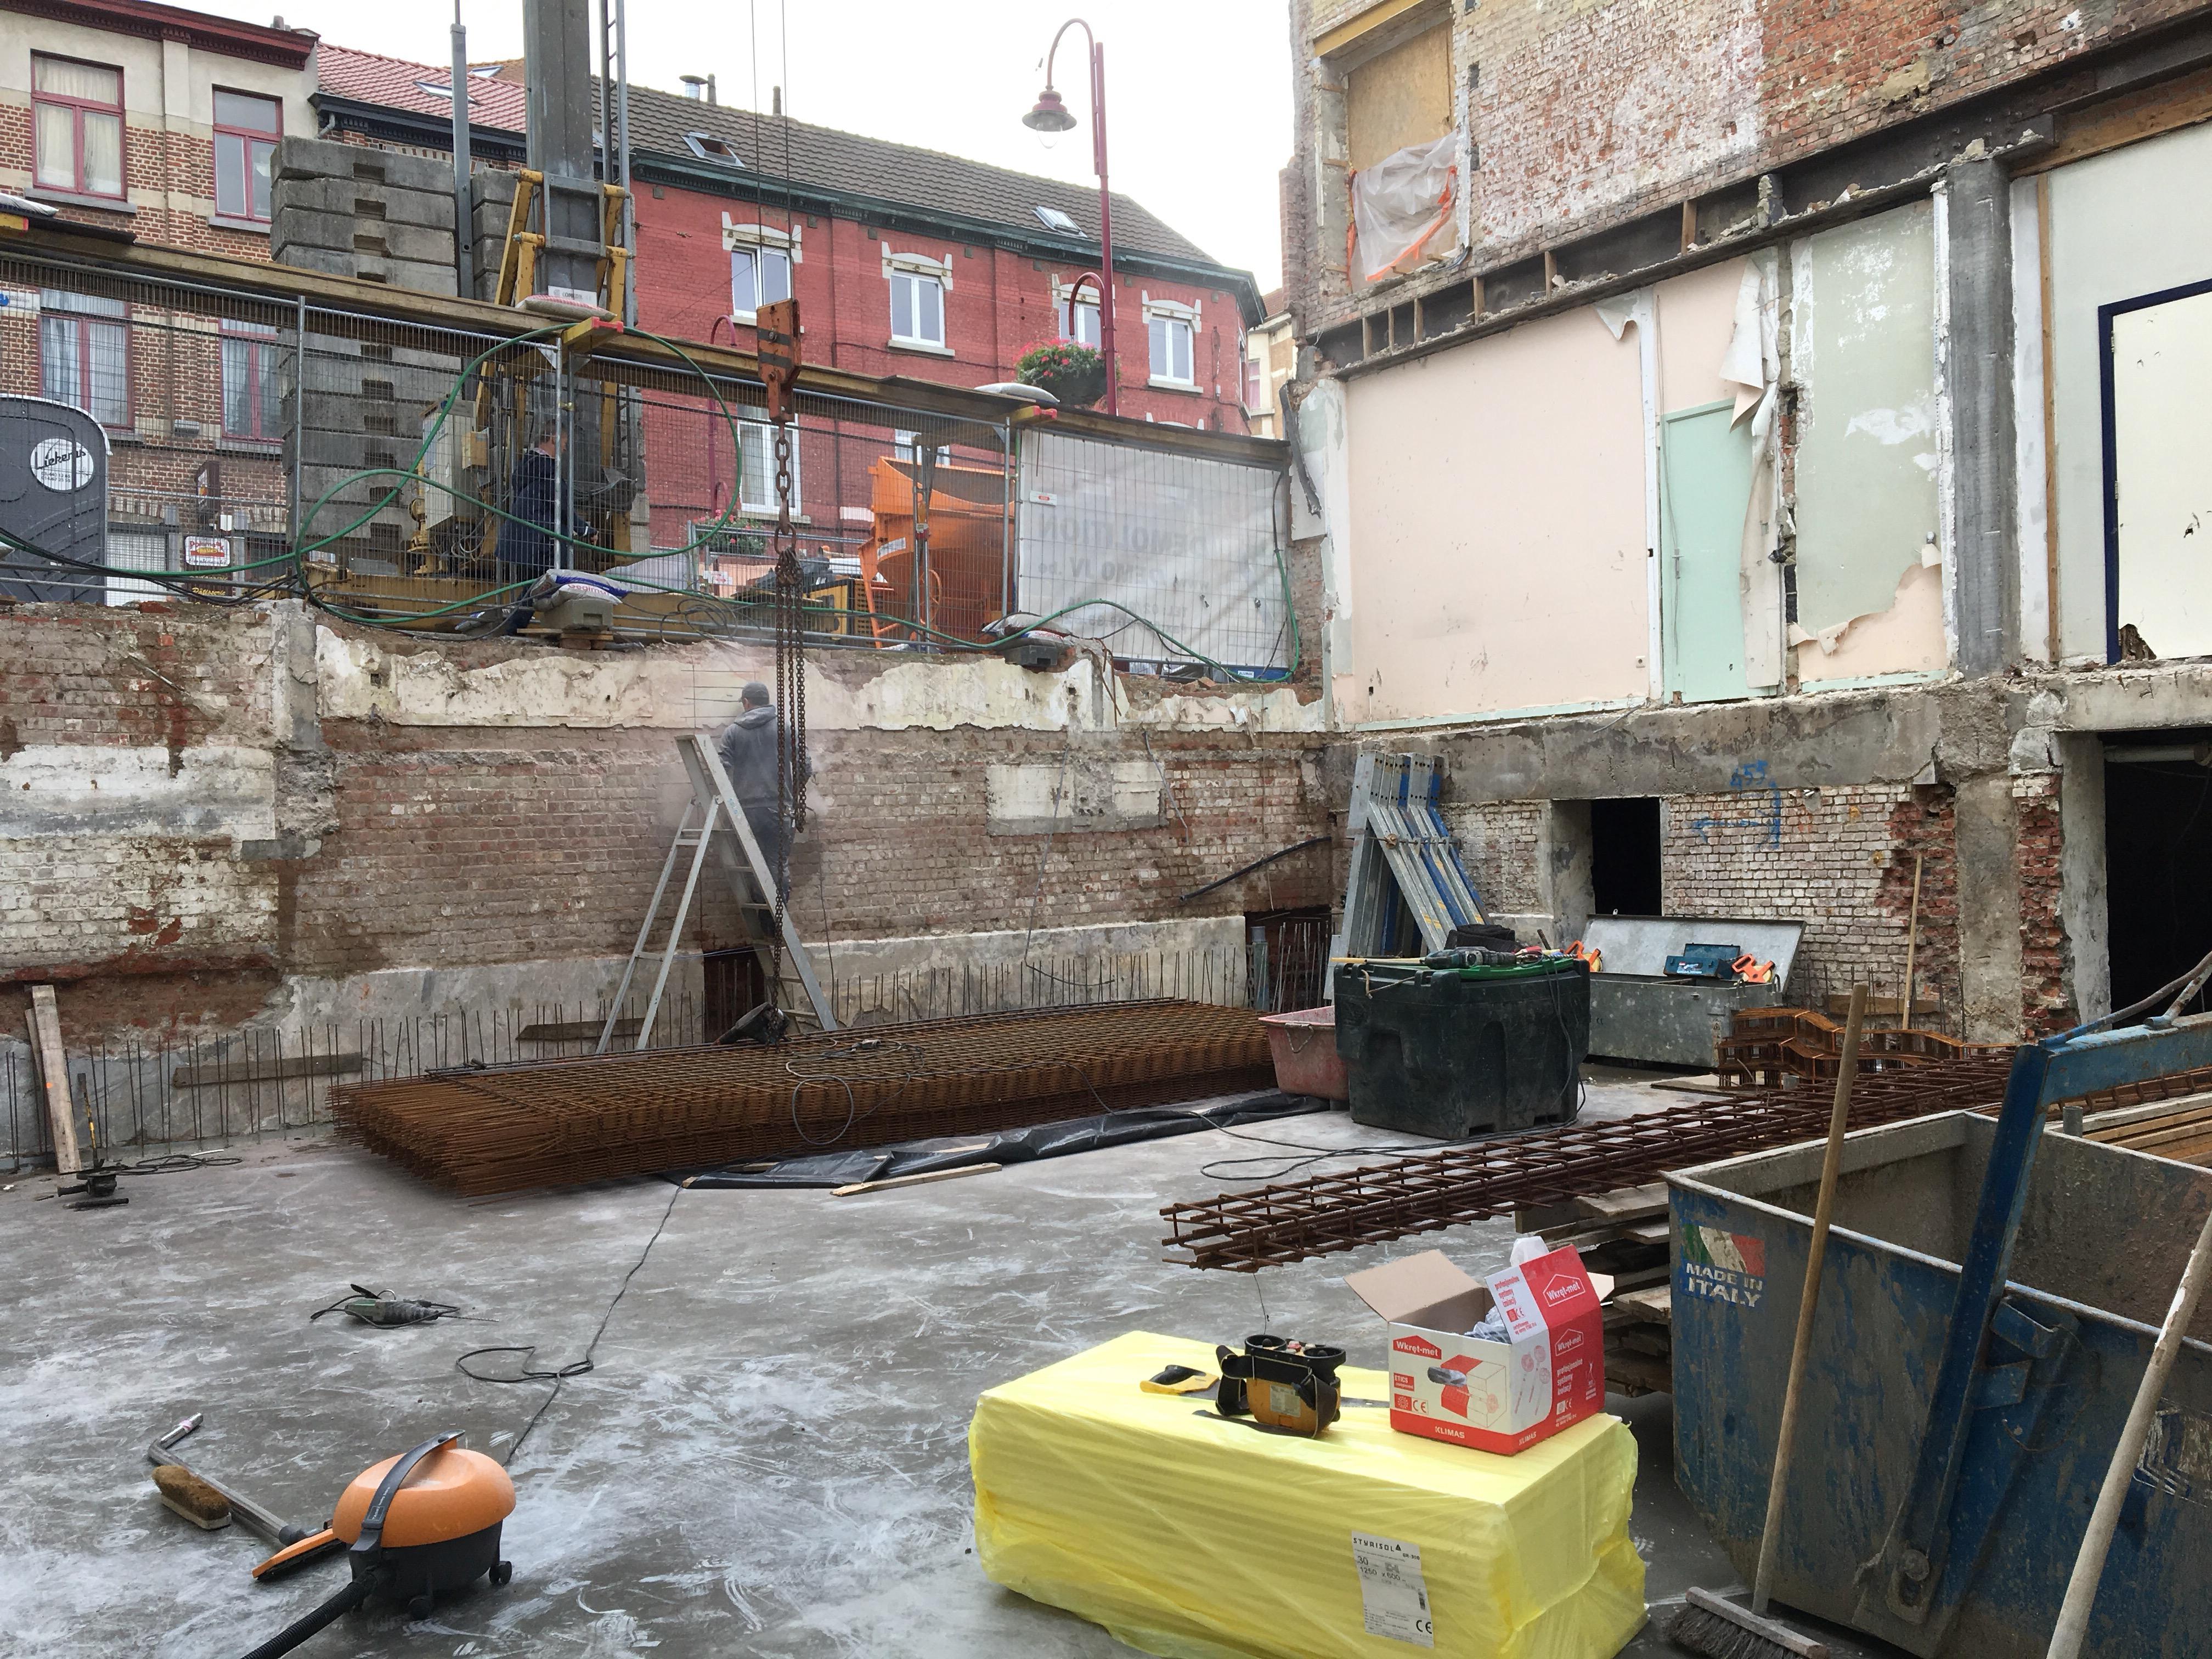 Canal Porn Maquinas Cons renovatie project te brussel - wbuild bouw-en projectcoördinatie